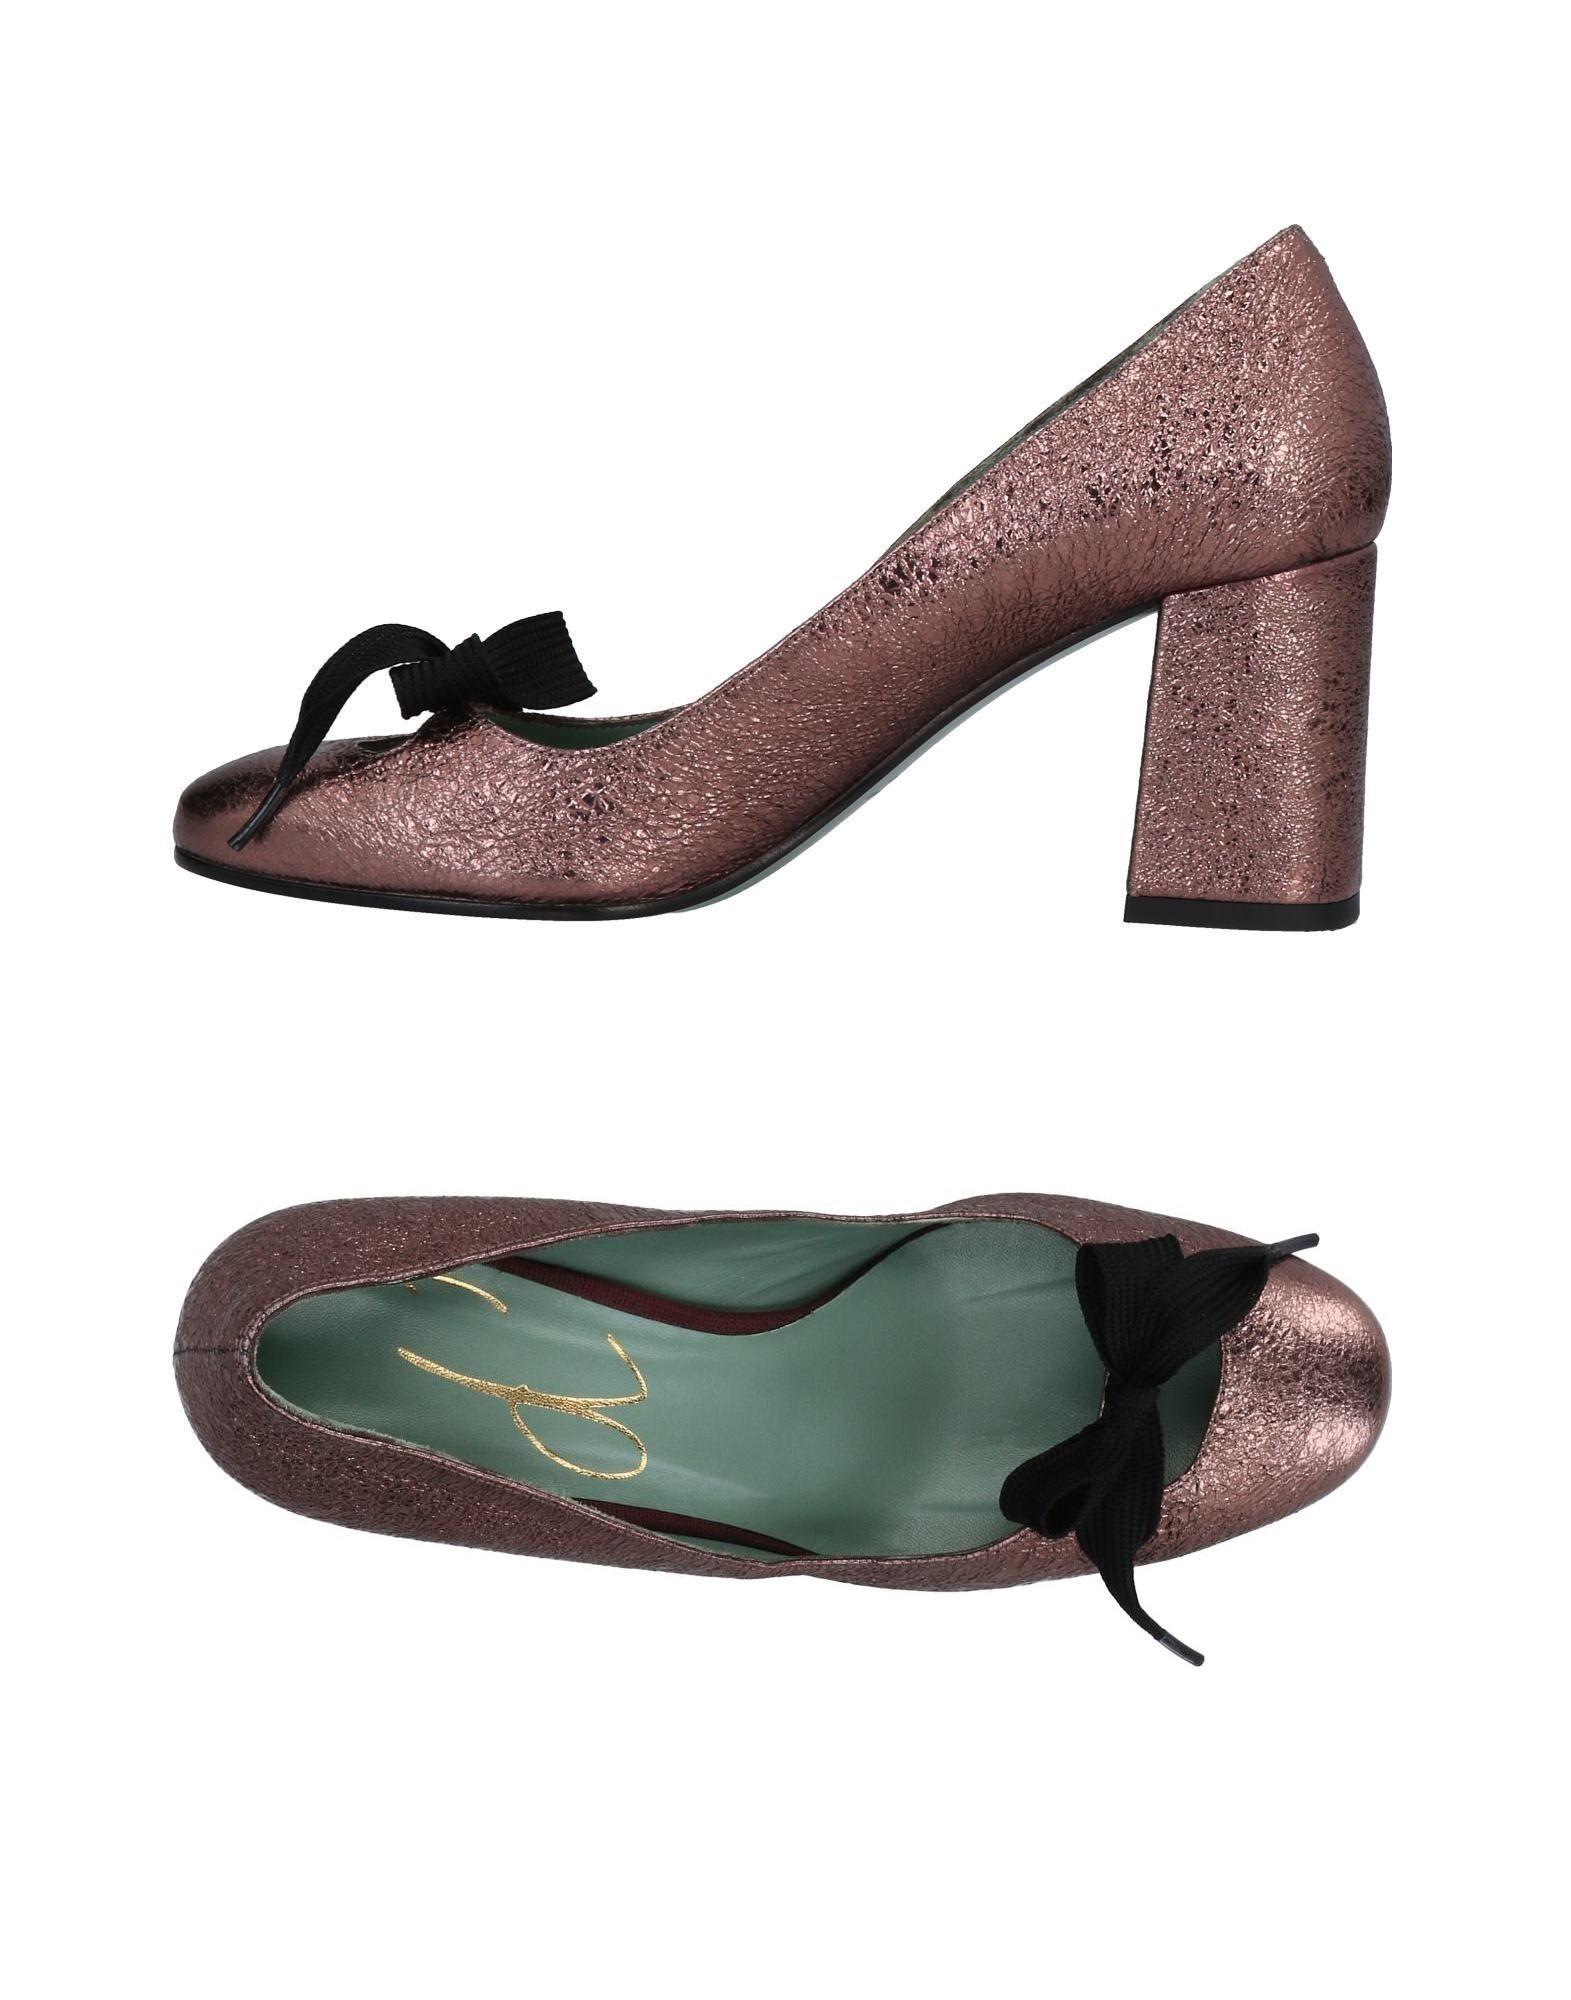 Moda barata y hermosa Salón Zapato De Salón hermosa Paola D'arcano Mujer - Salones Paola D'arcano  Rosa pastel f84d8e